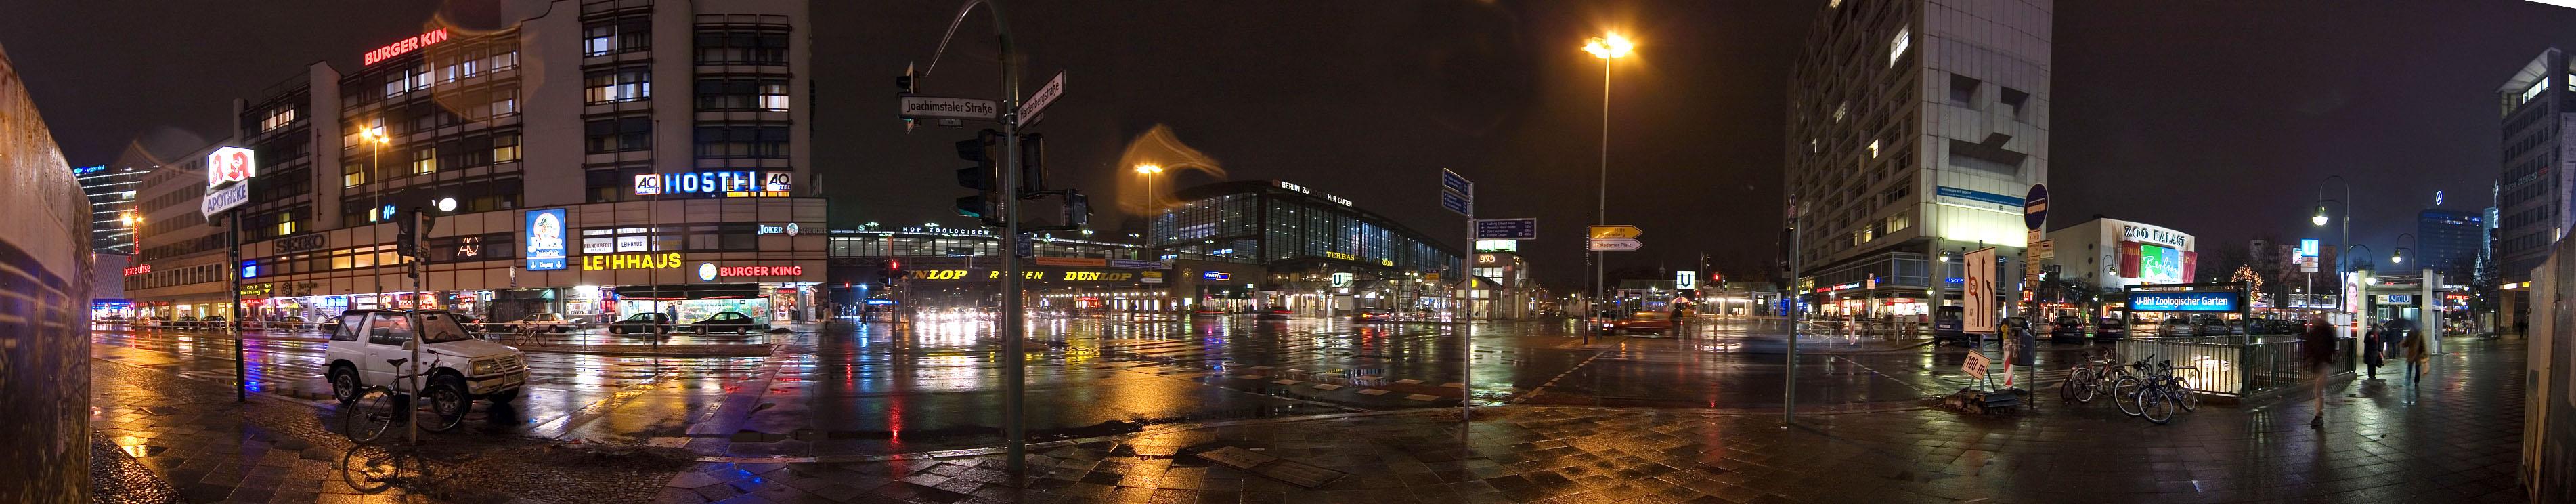 Berlin: Stations